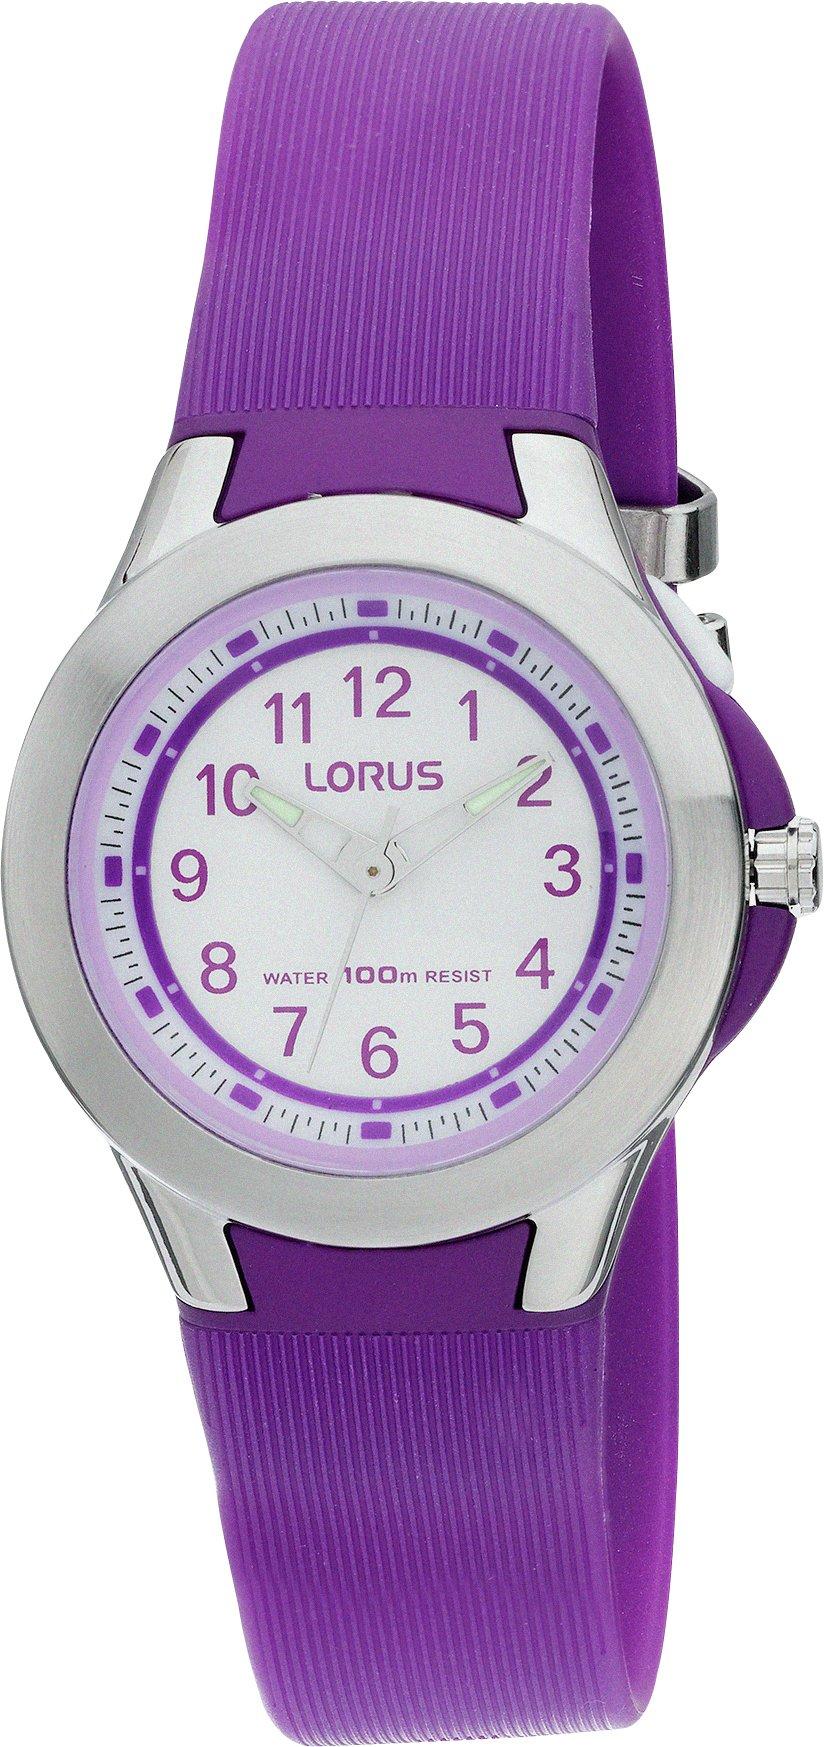 Lorus Ladies' Purple Analogue Strap Watch